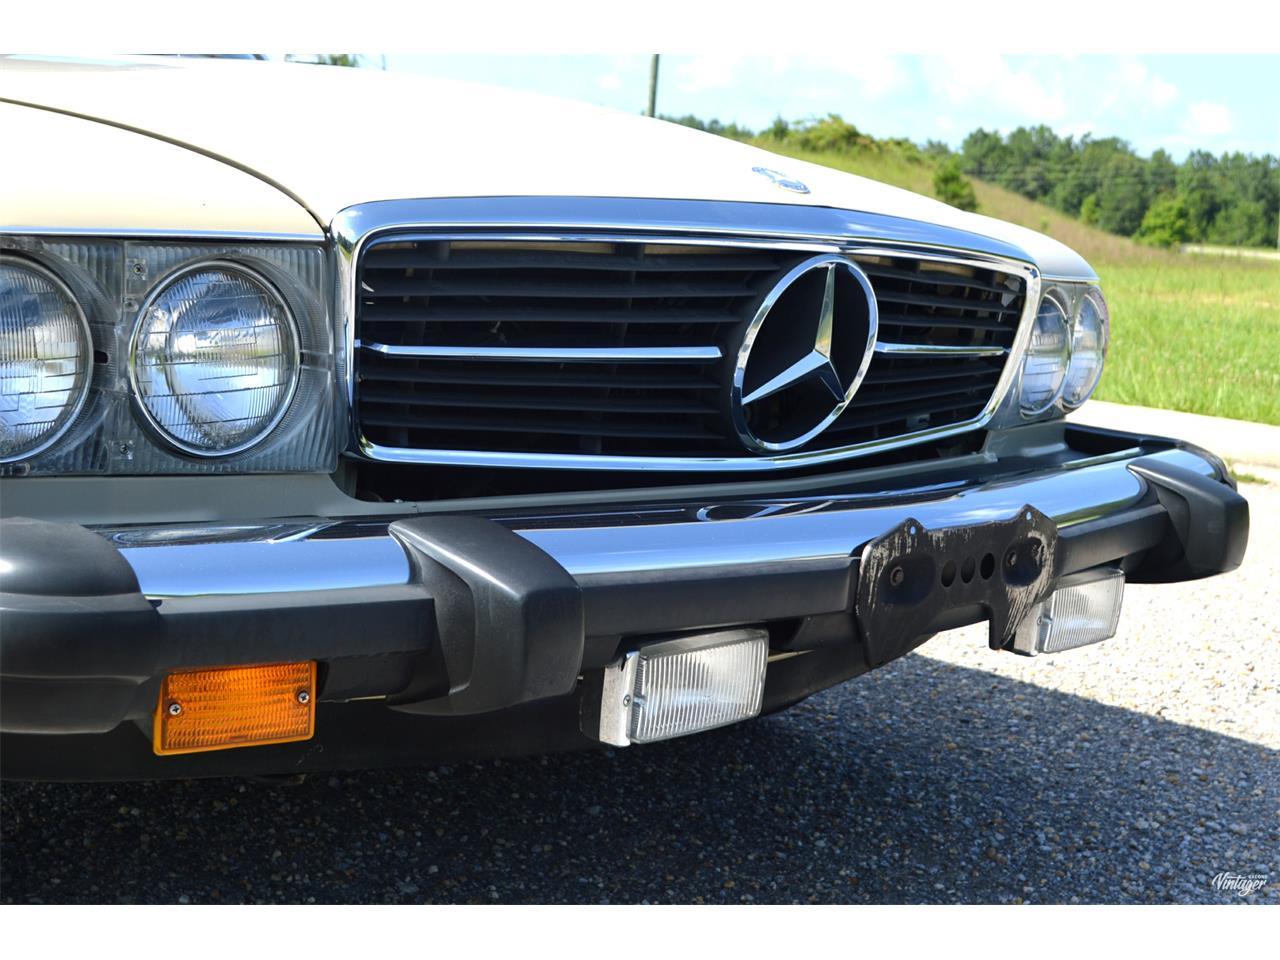 Large Picture of '80 450SL located in Alabaster Alabama - $15,500.00 - LEDI